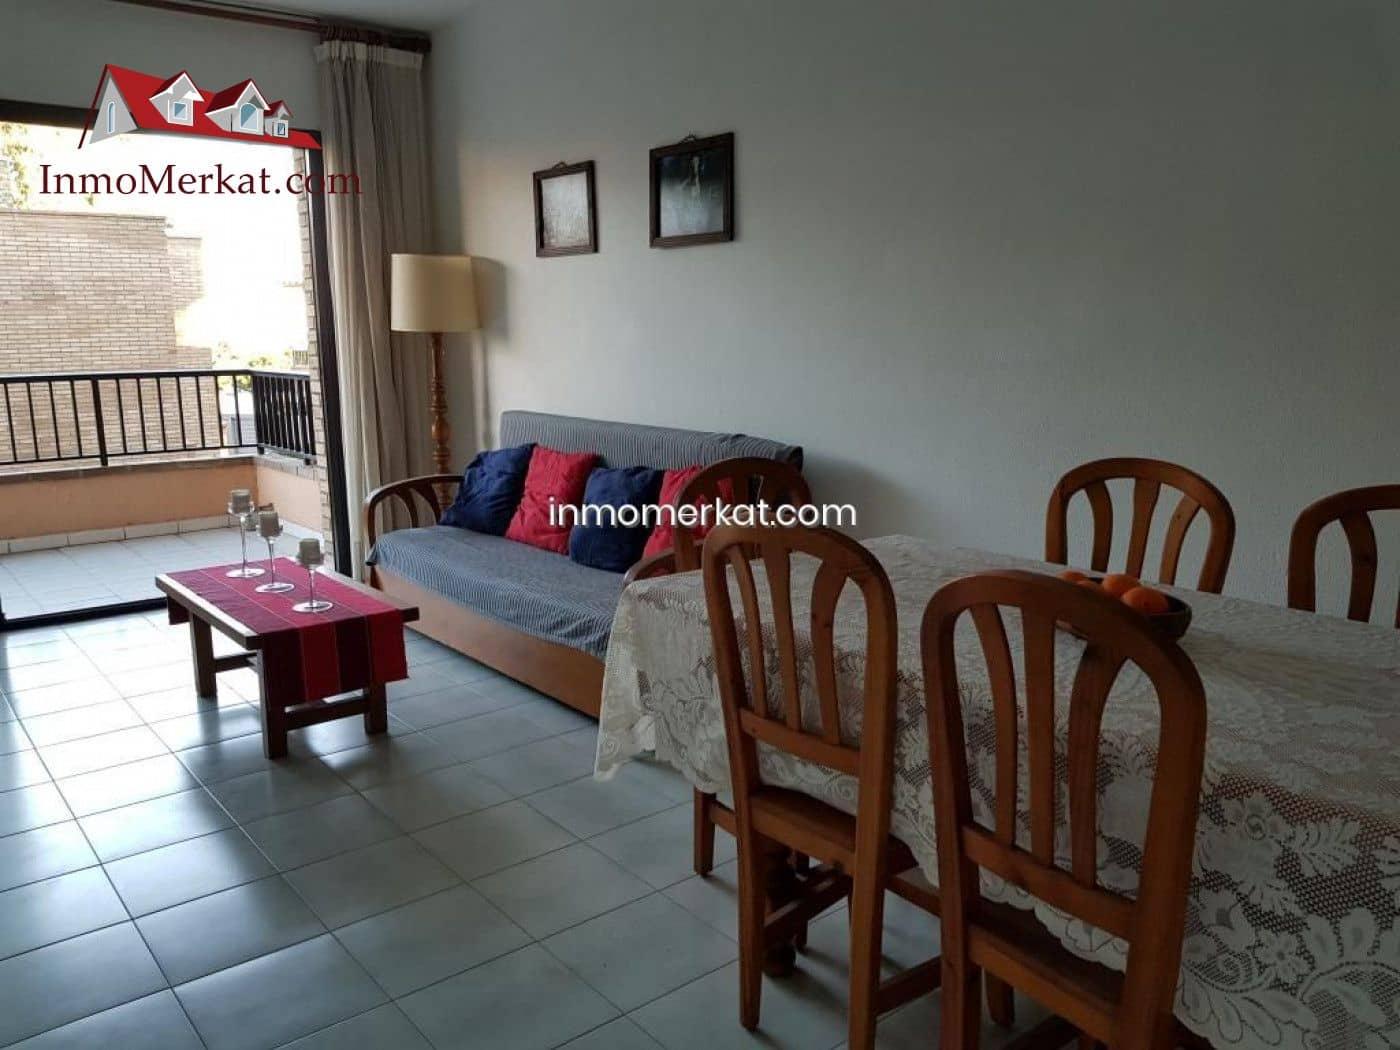 2 bedroom Flat for sale in Lloret de Mar with pool - € 219,000 (Ref: 6170431)